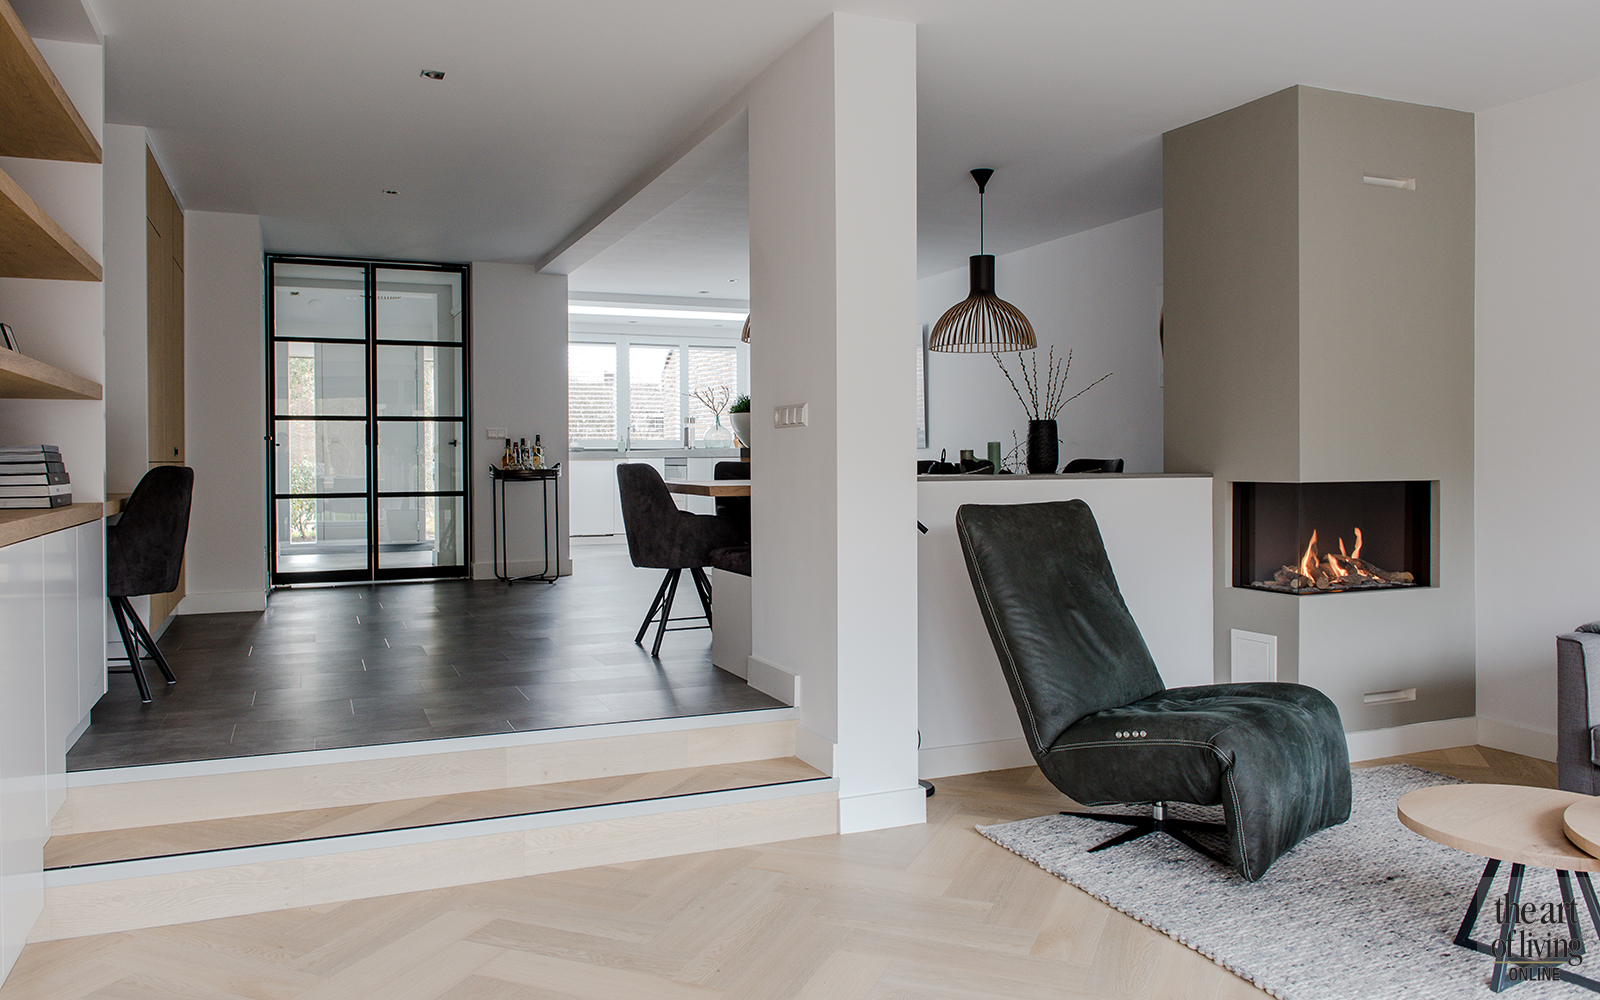 Intieme grijze woonkamer lifs interieuradvies styling for Grijze woonkamer